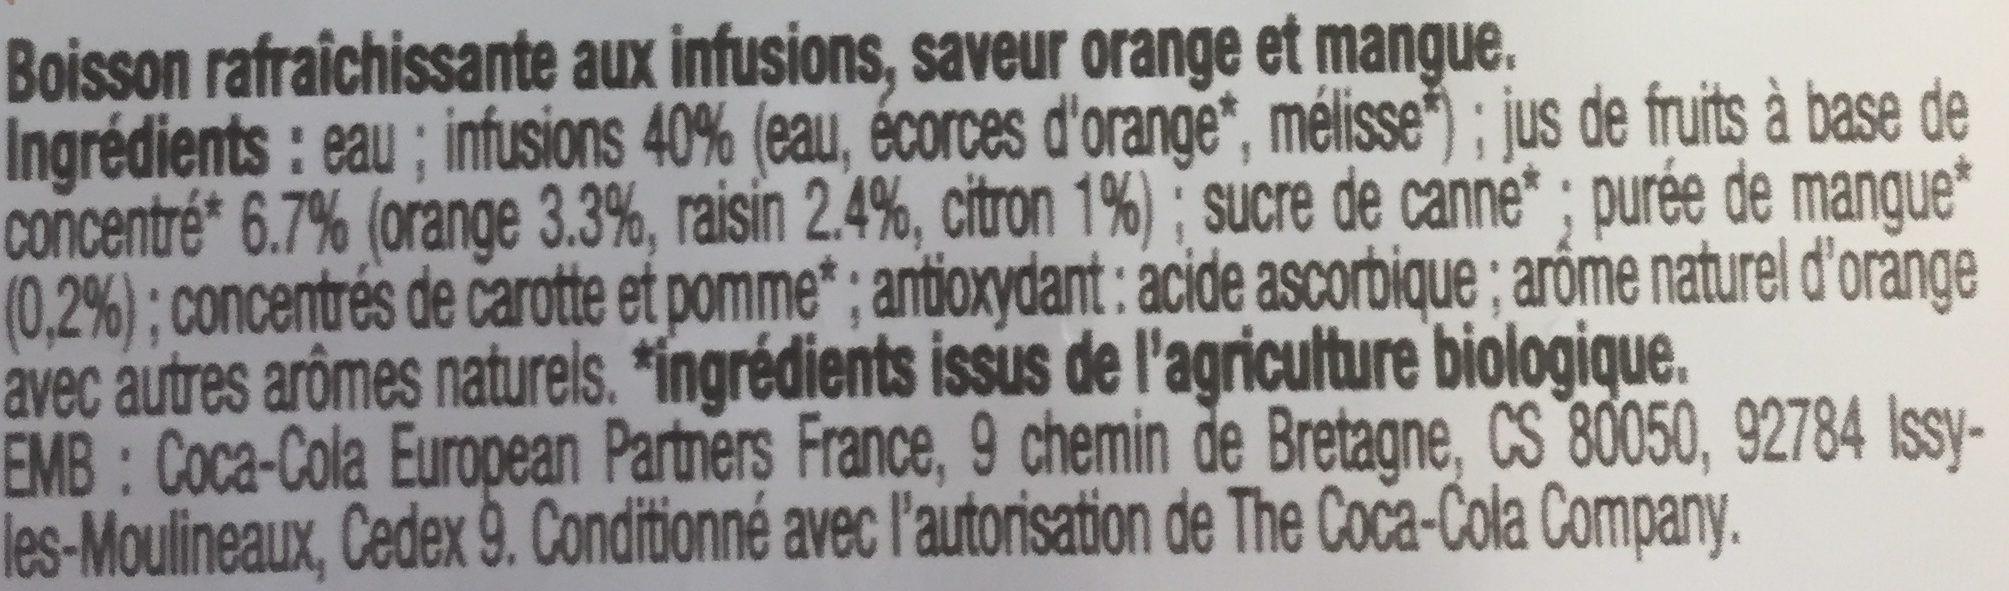 Honest Infusion Bio - Ingredients - fr